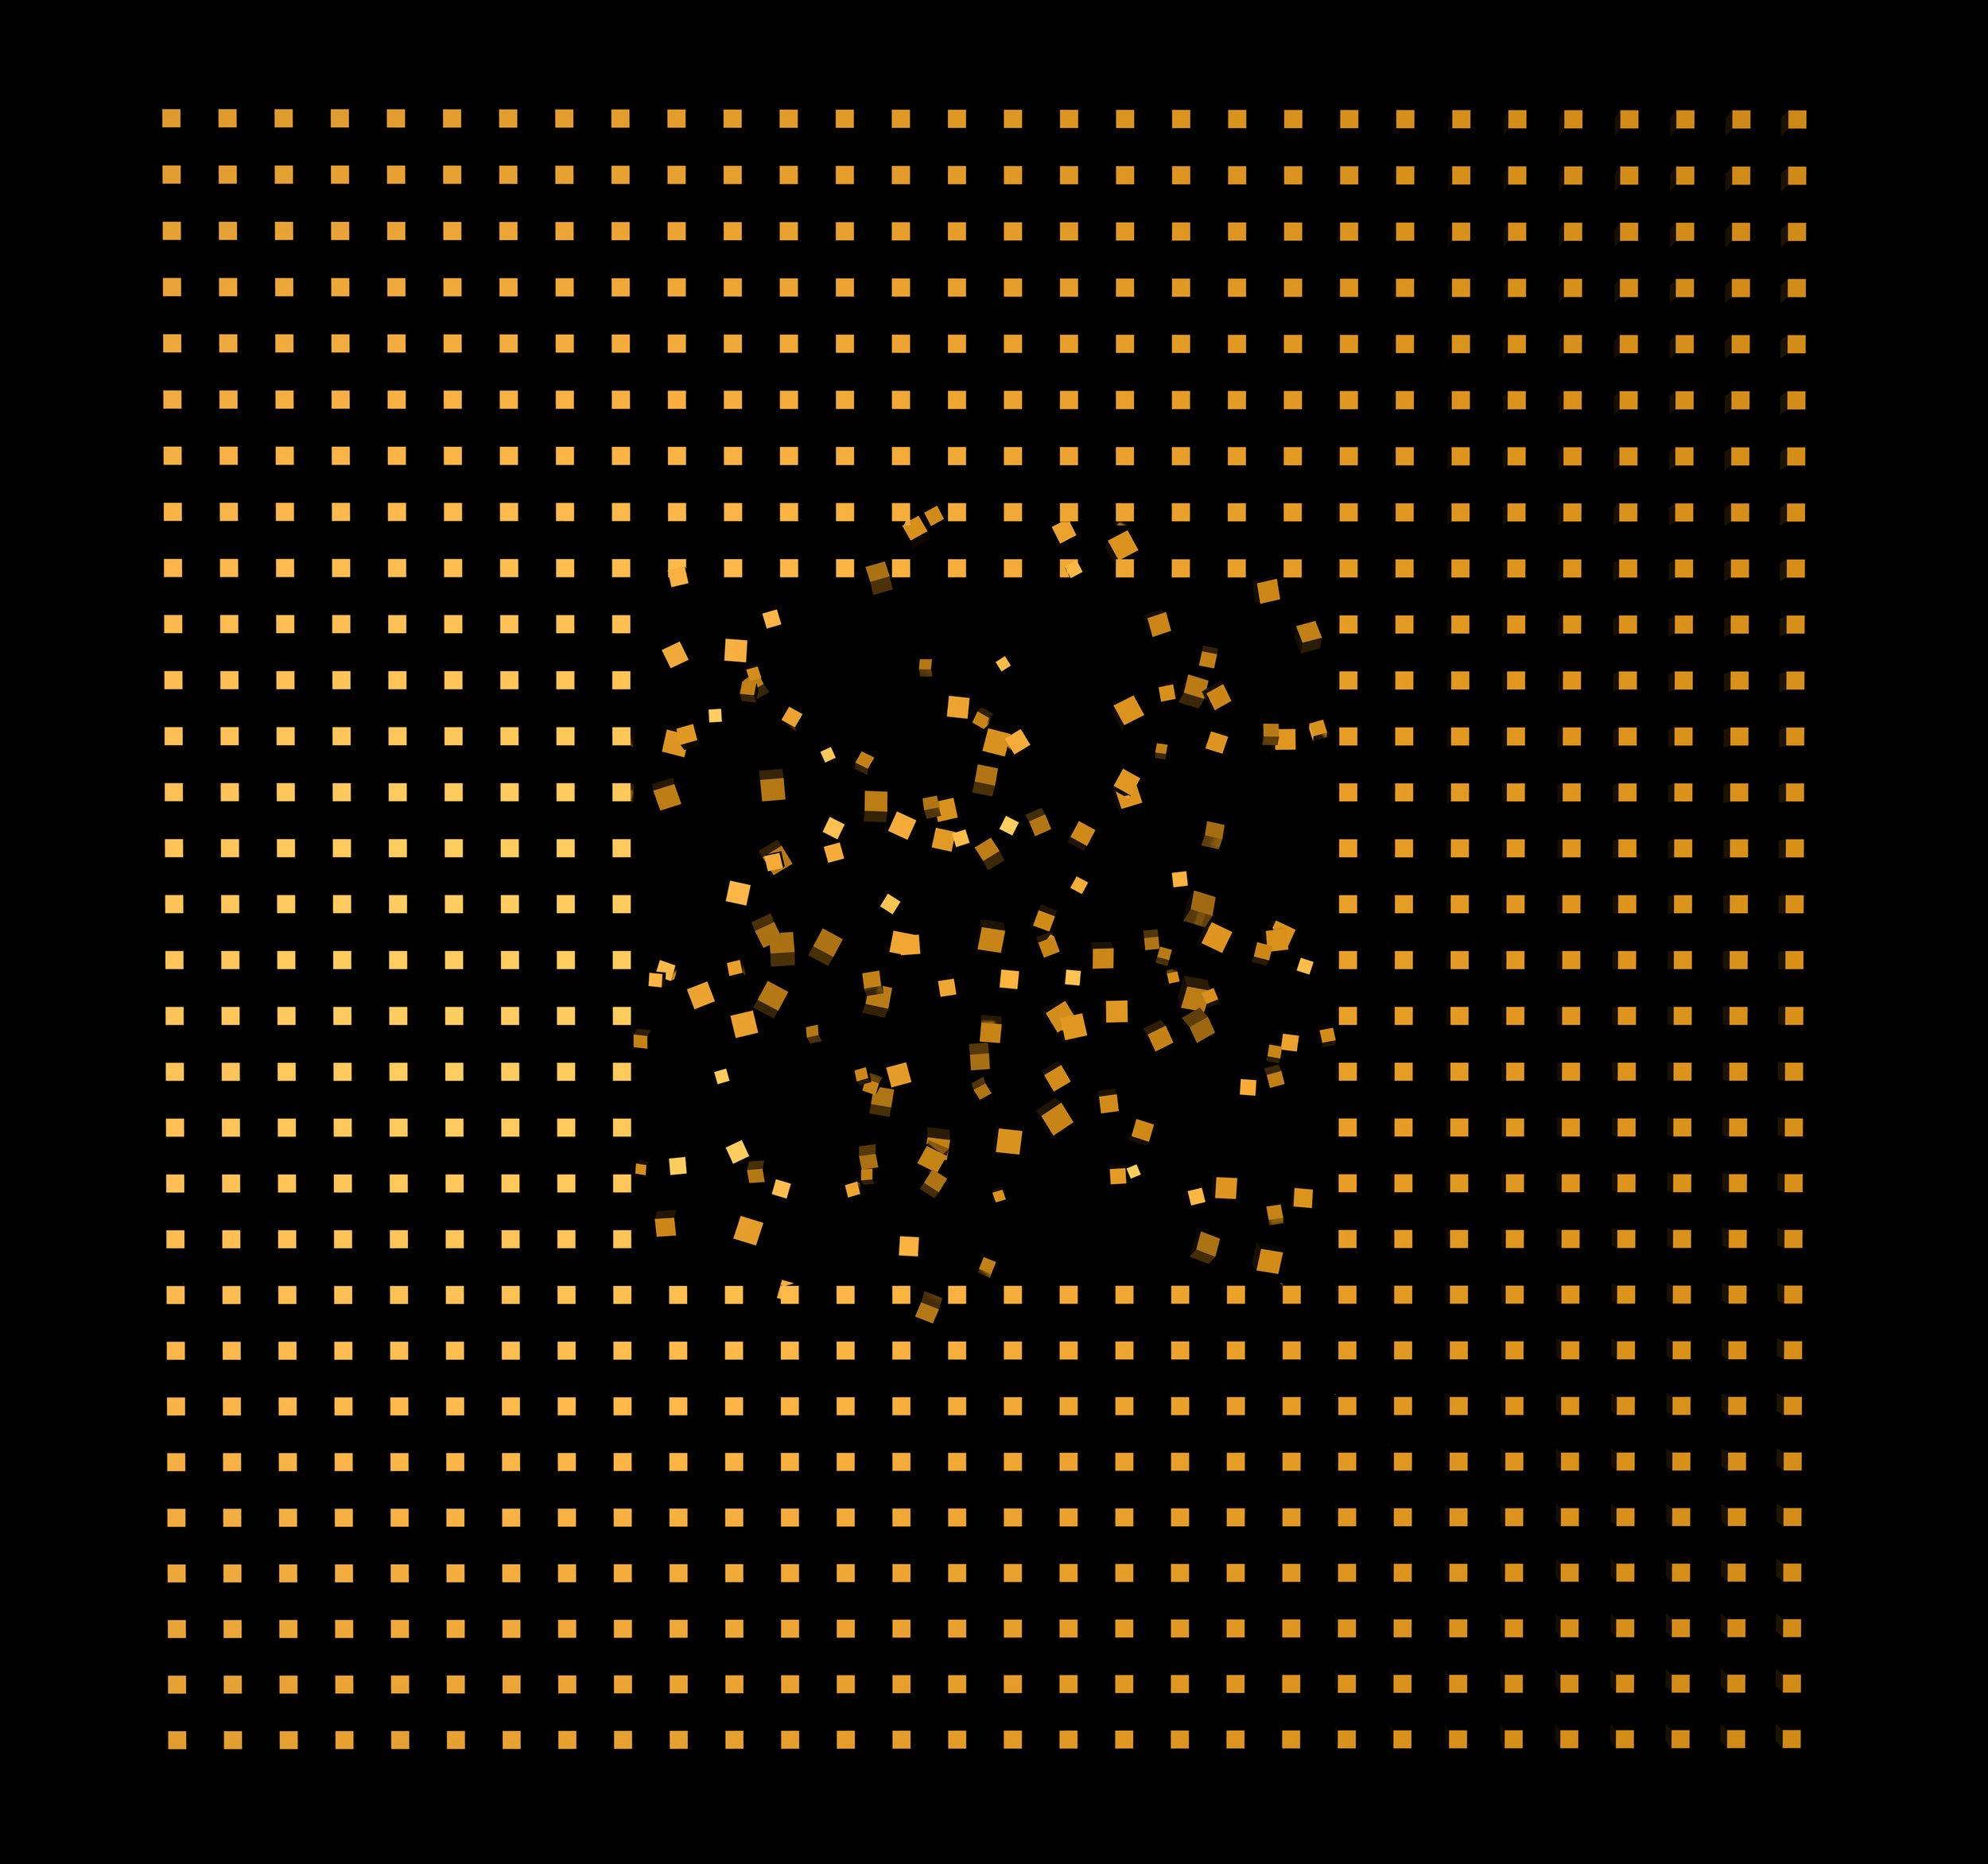 squares 9.jpg